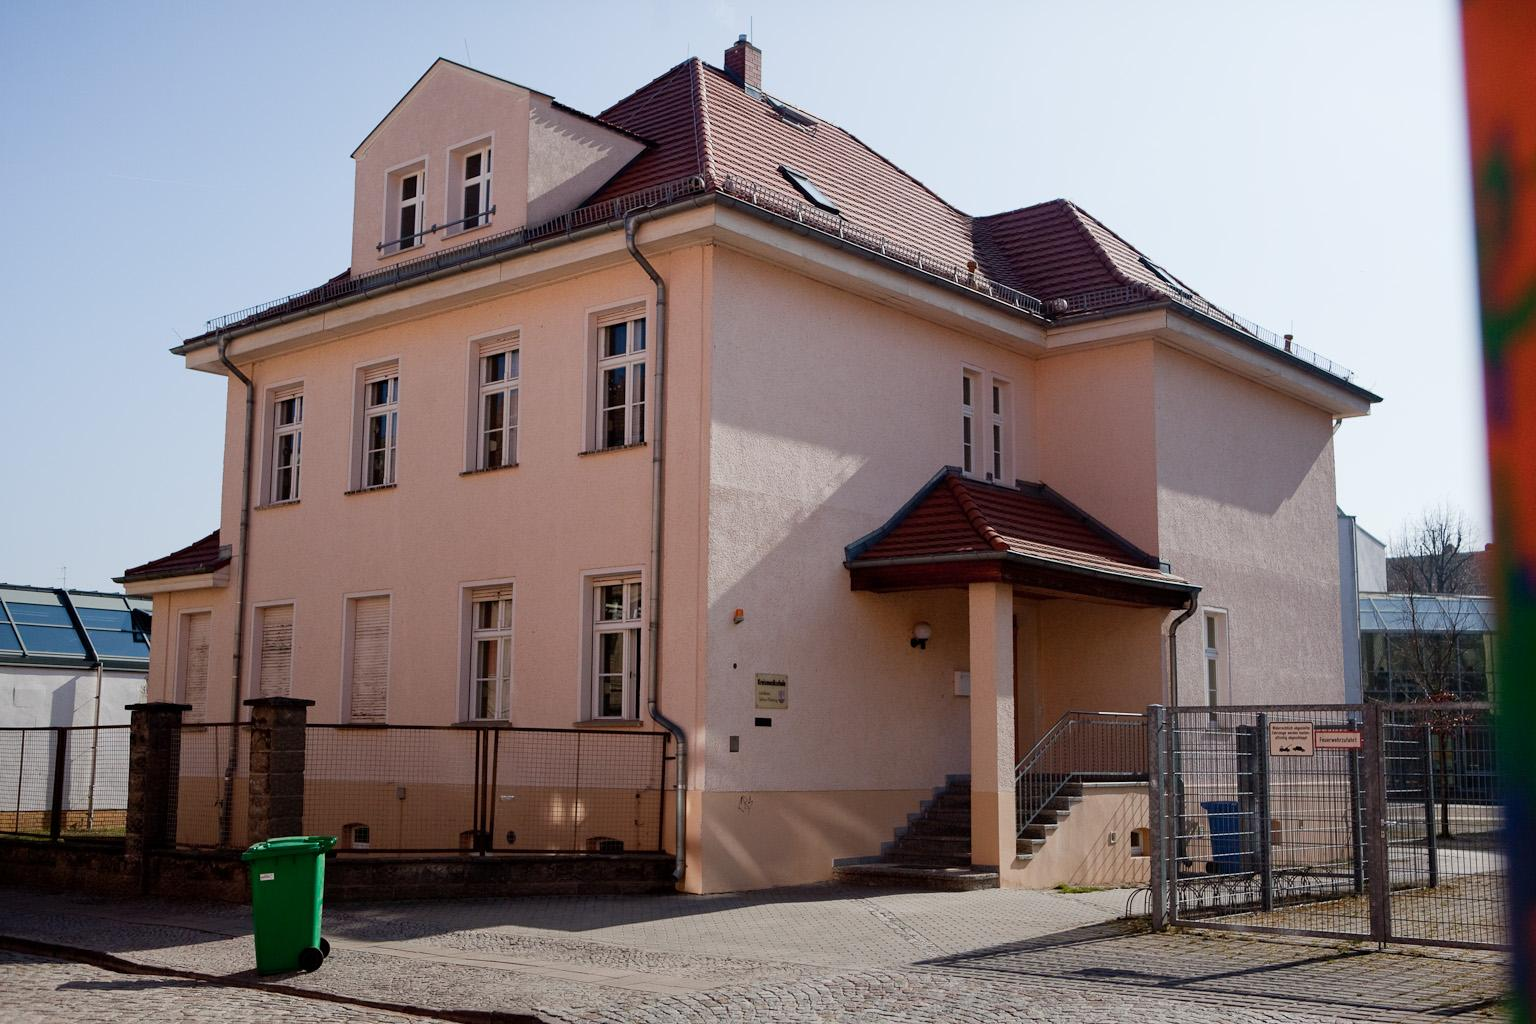 Kreismusikschule Teltow-Fläming in Luckenwalde